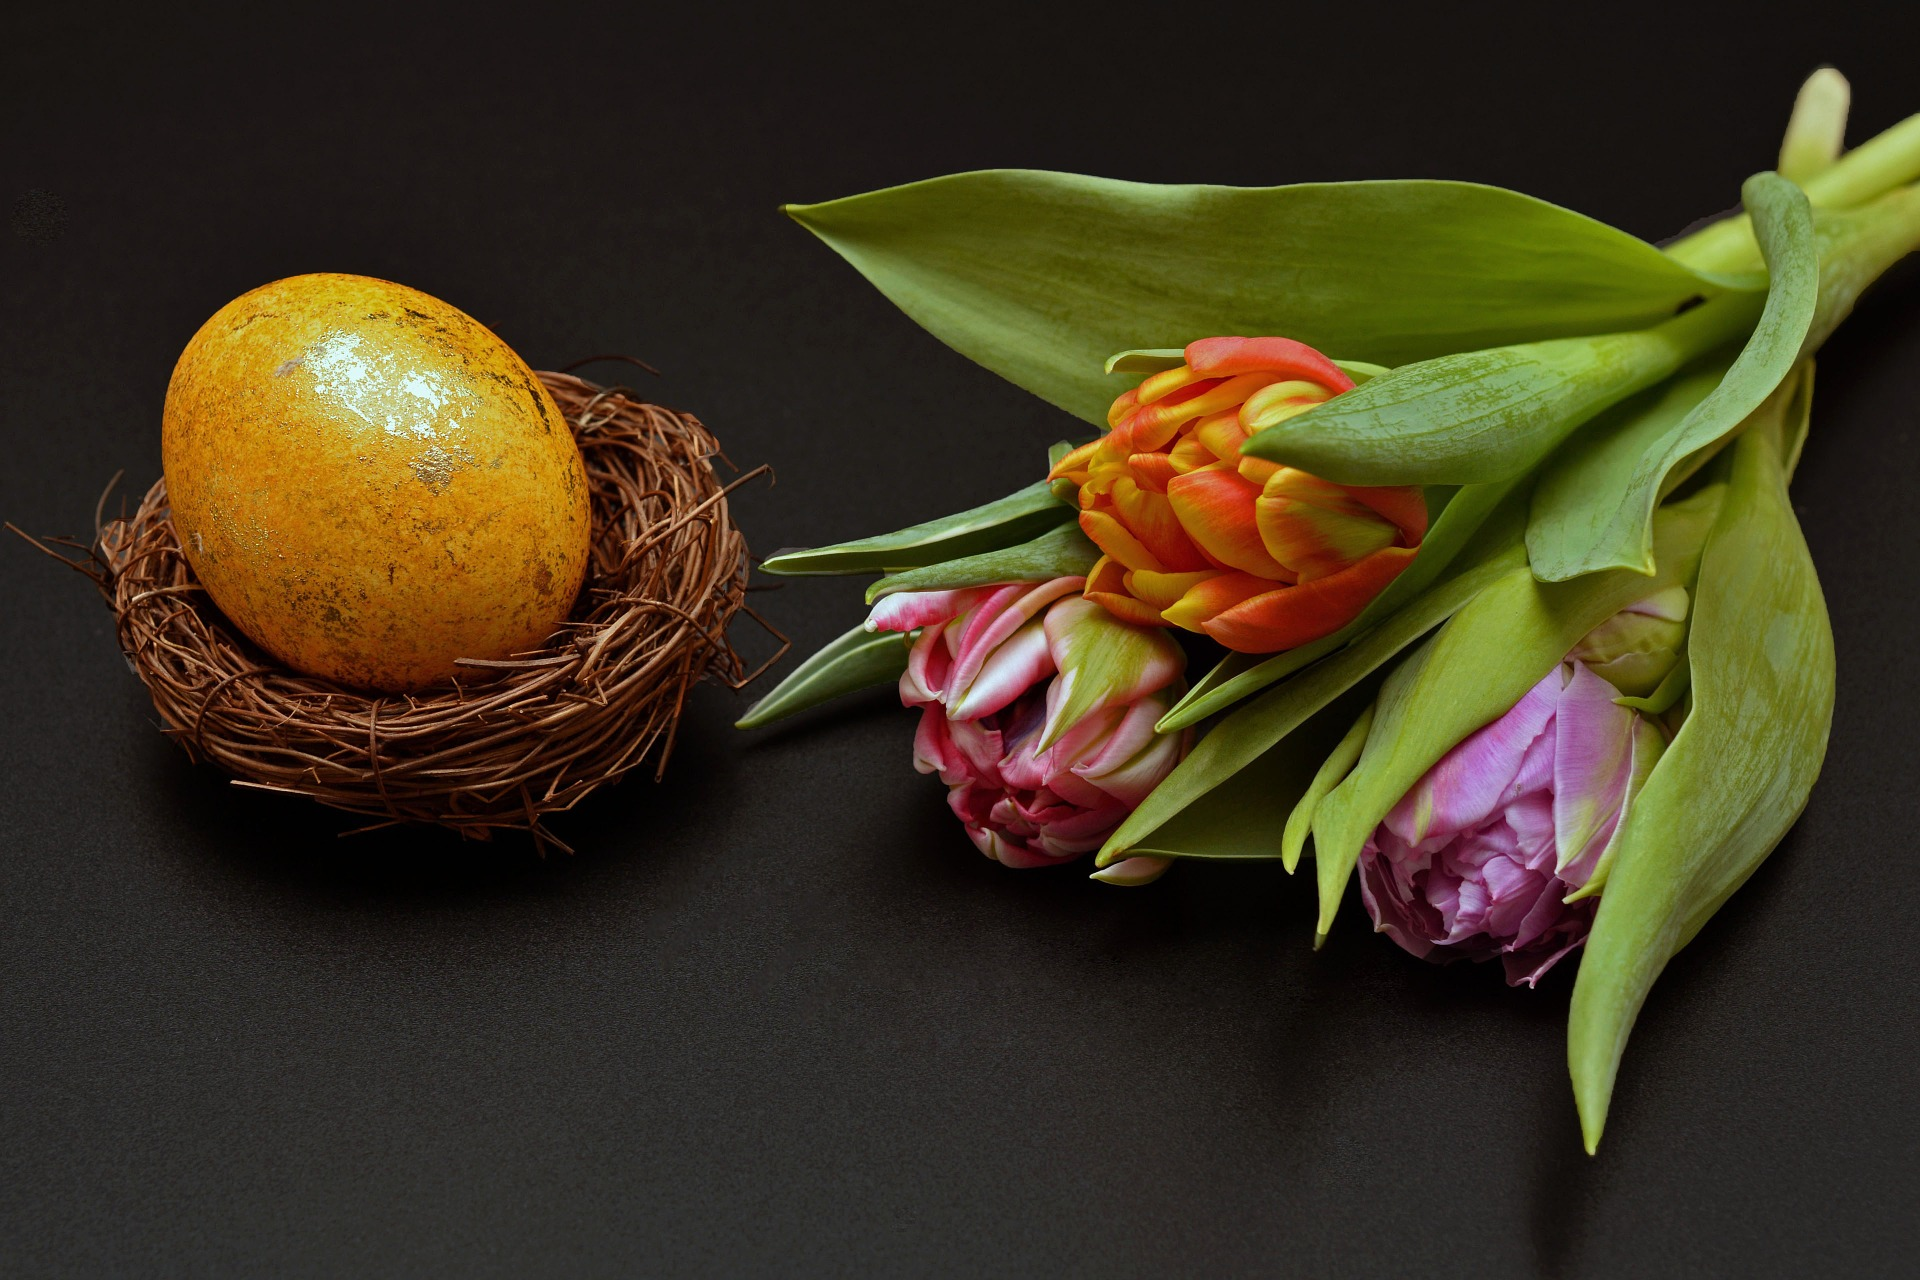 Flower Arrangement - Easter